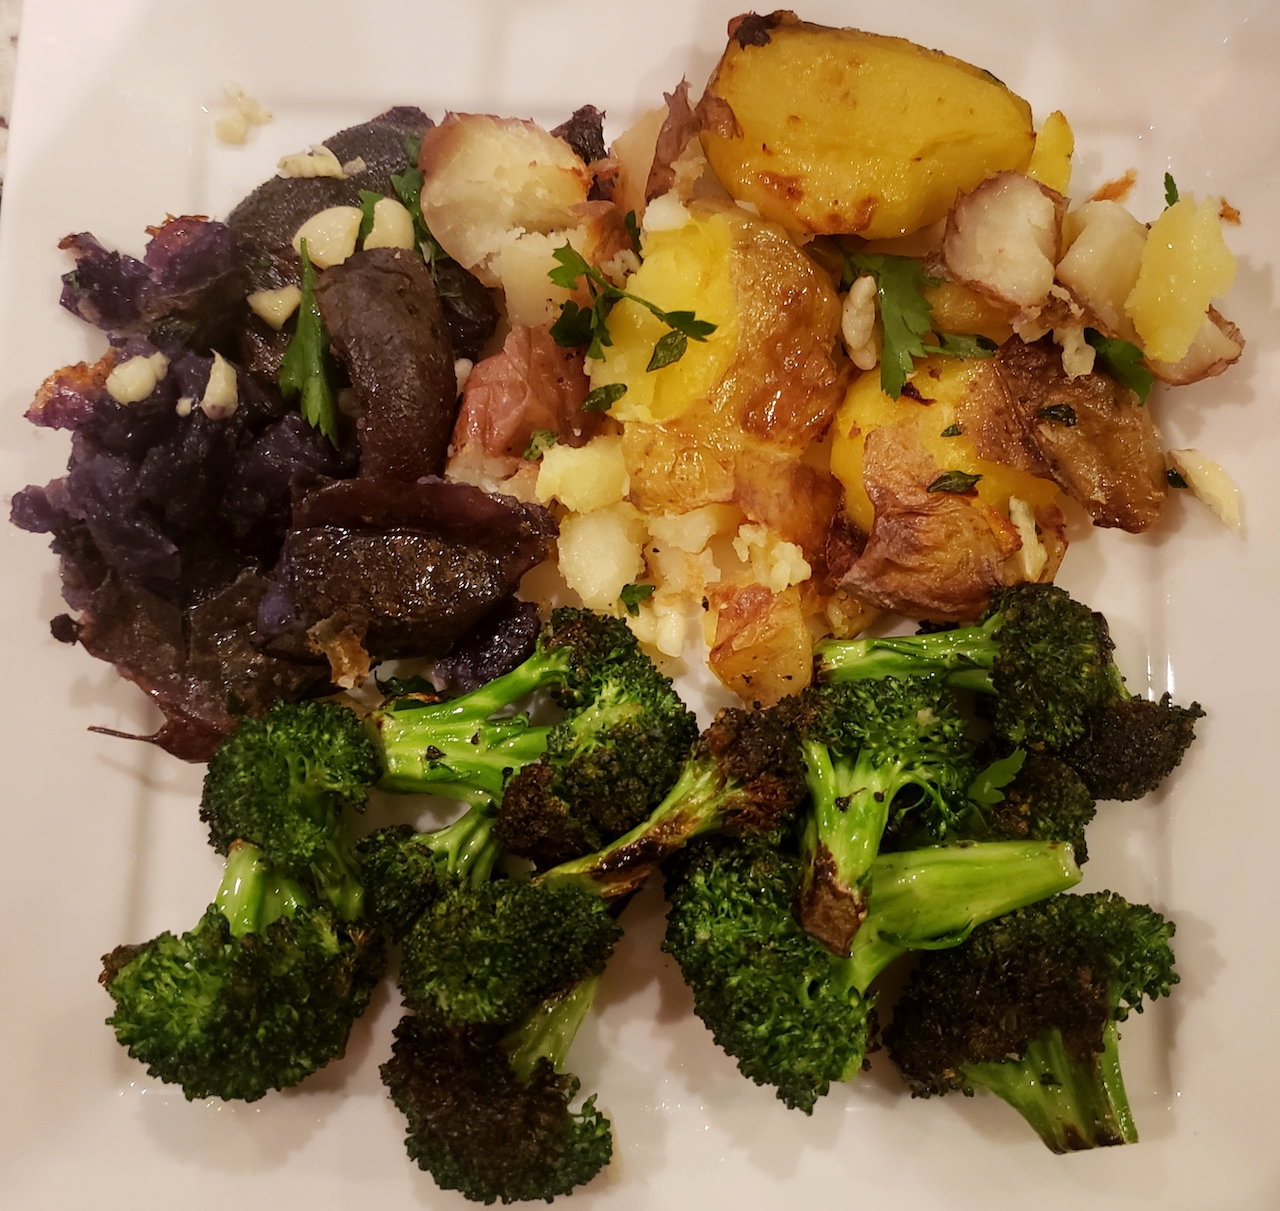 Crispy smashed potatoes with broccoli